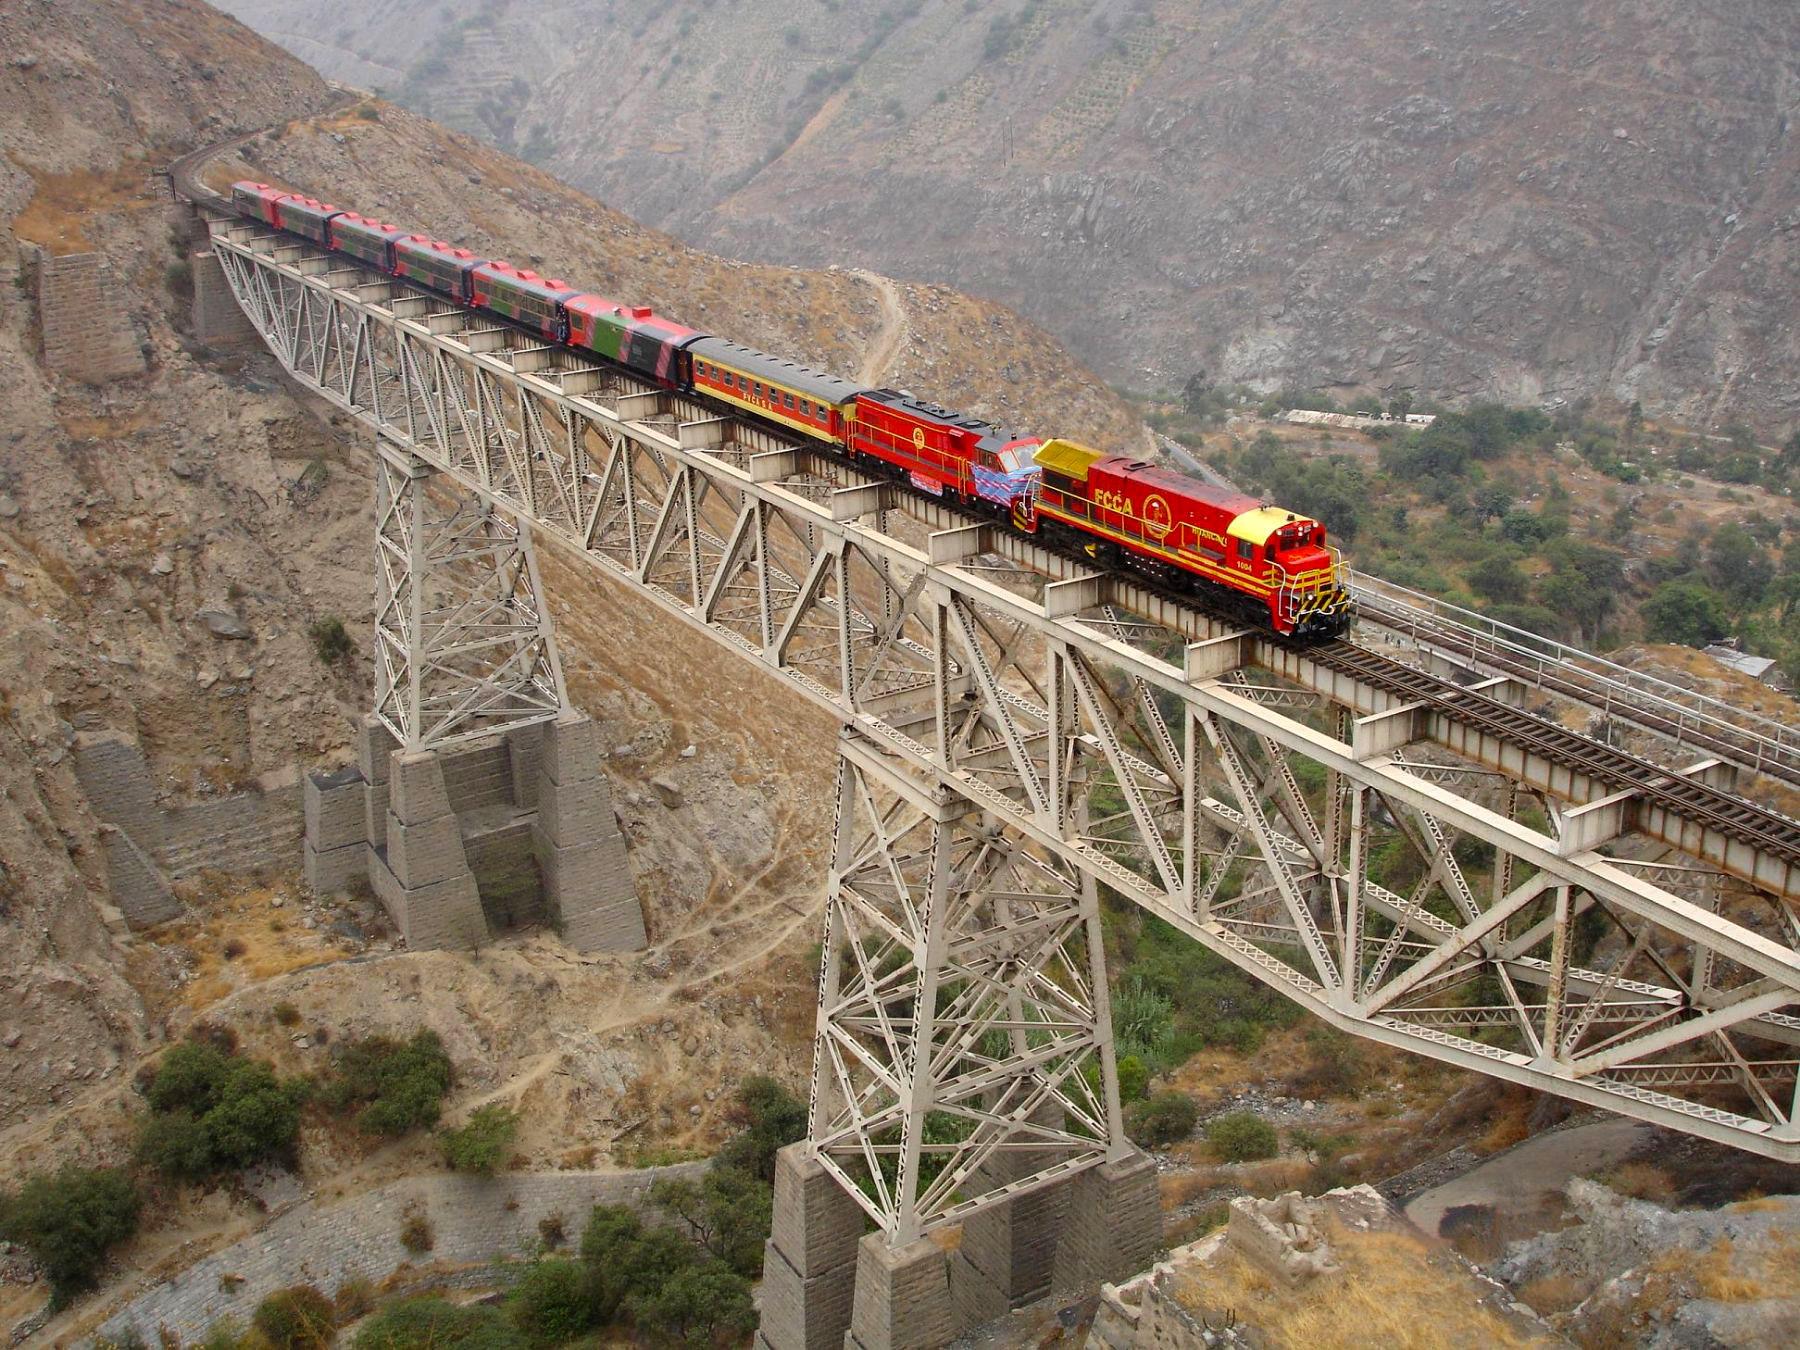 Lima to Huancayo Train over the Carrion Bridge